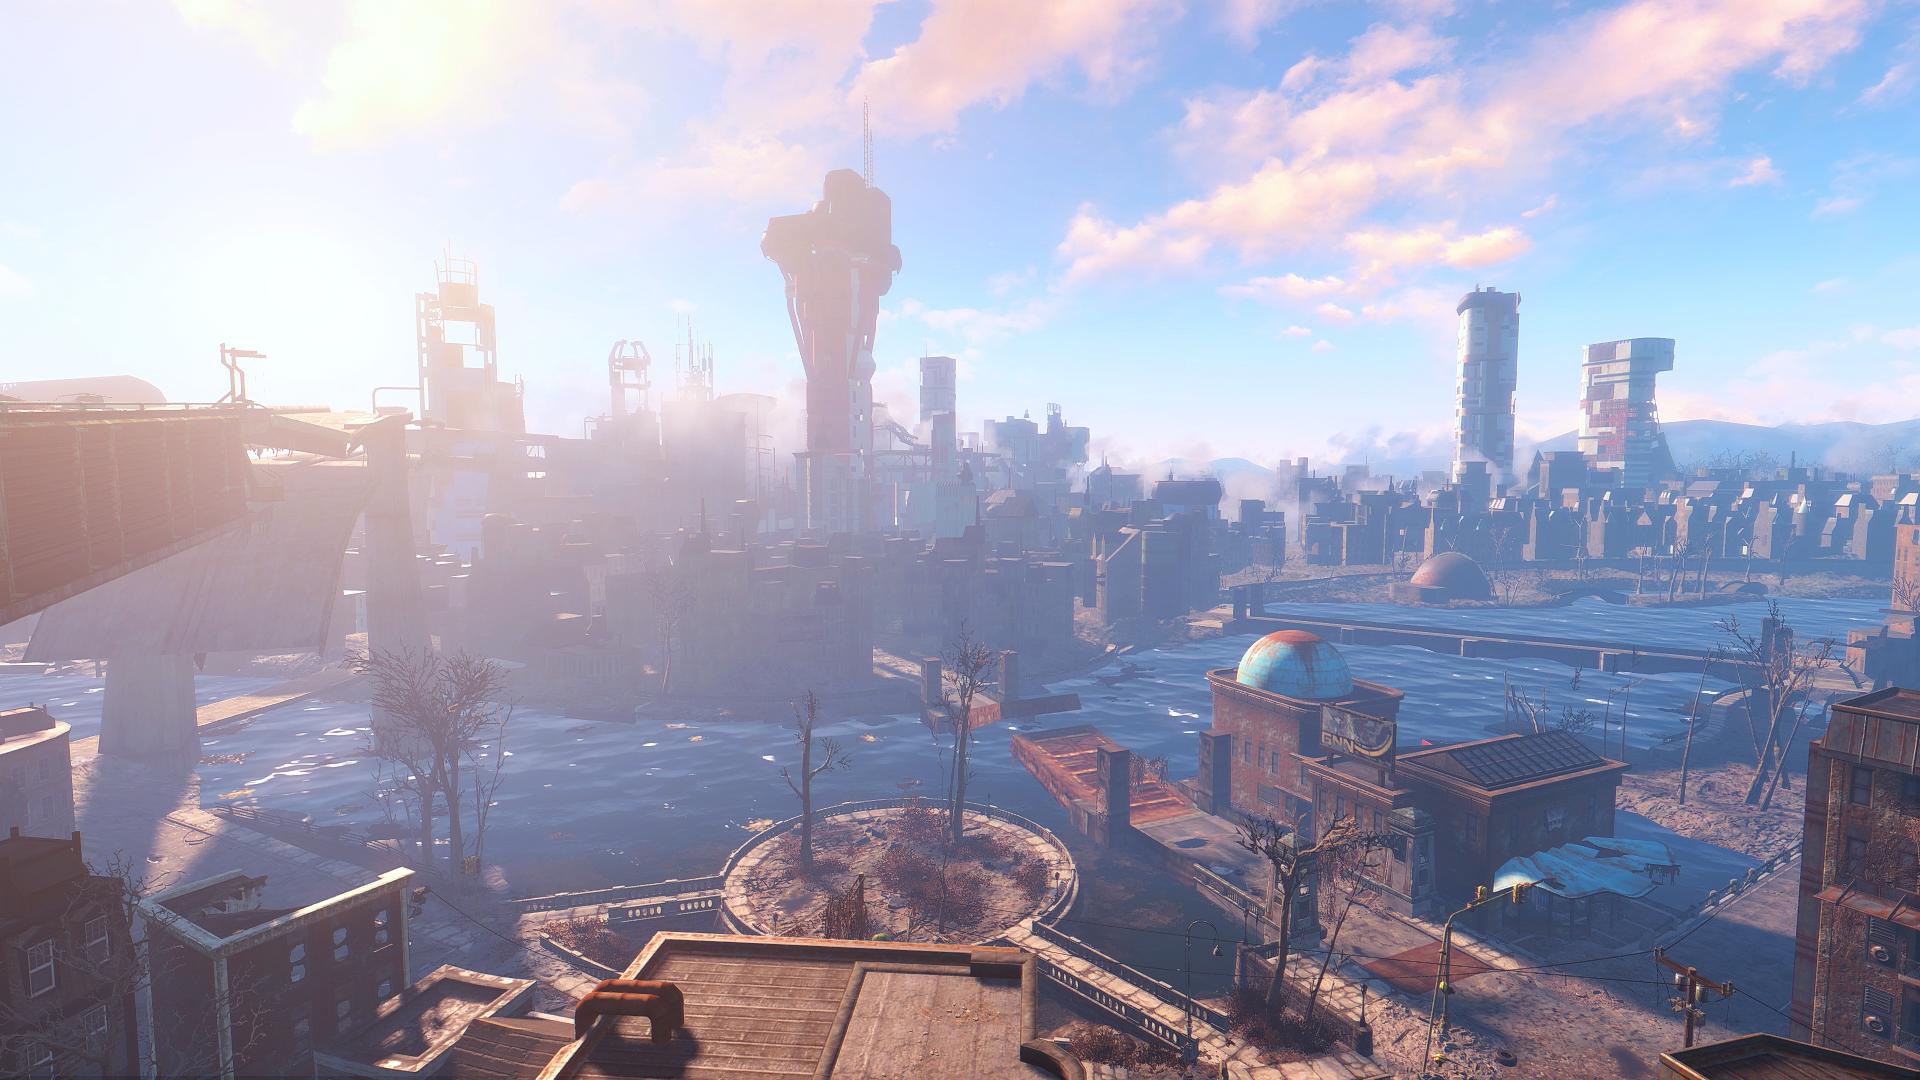 Fallout 4   Boston Overlook Wallpaper [1080p]   Imgur 1920x1080